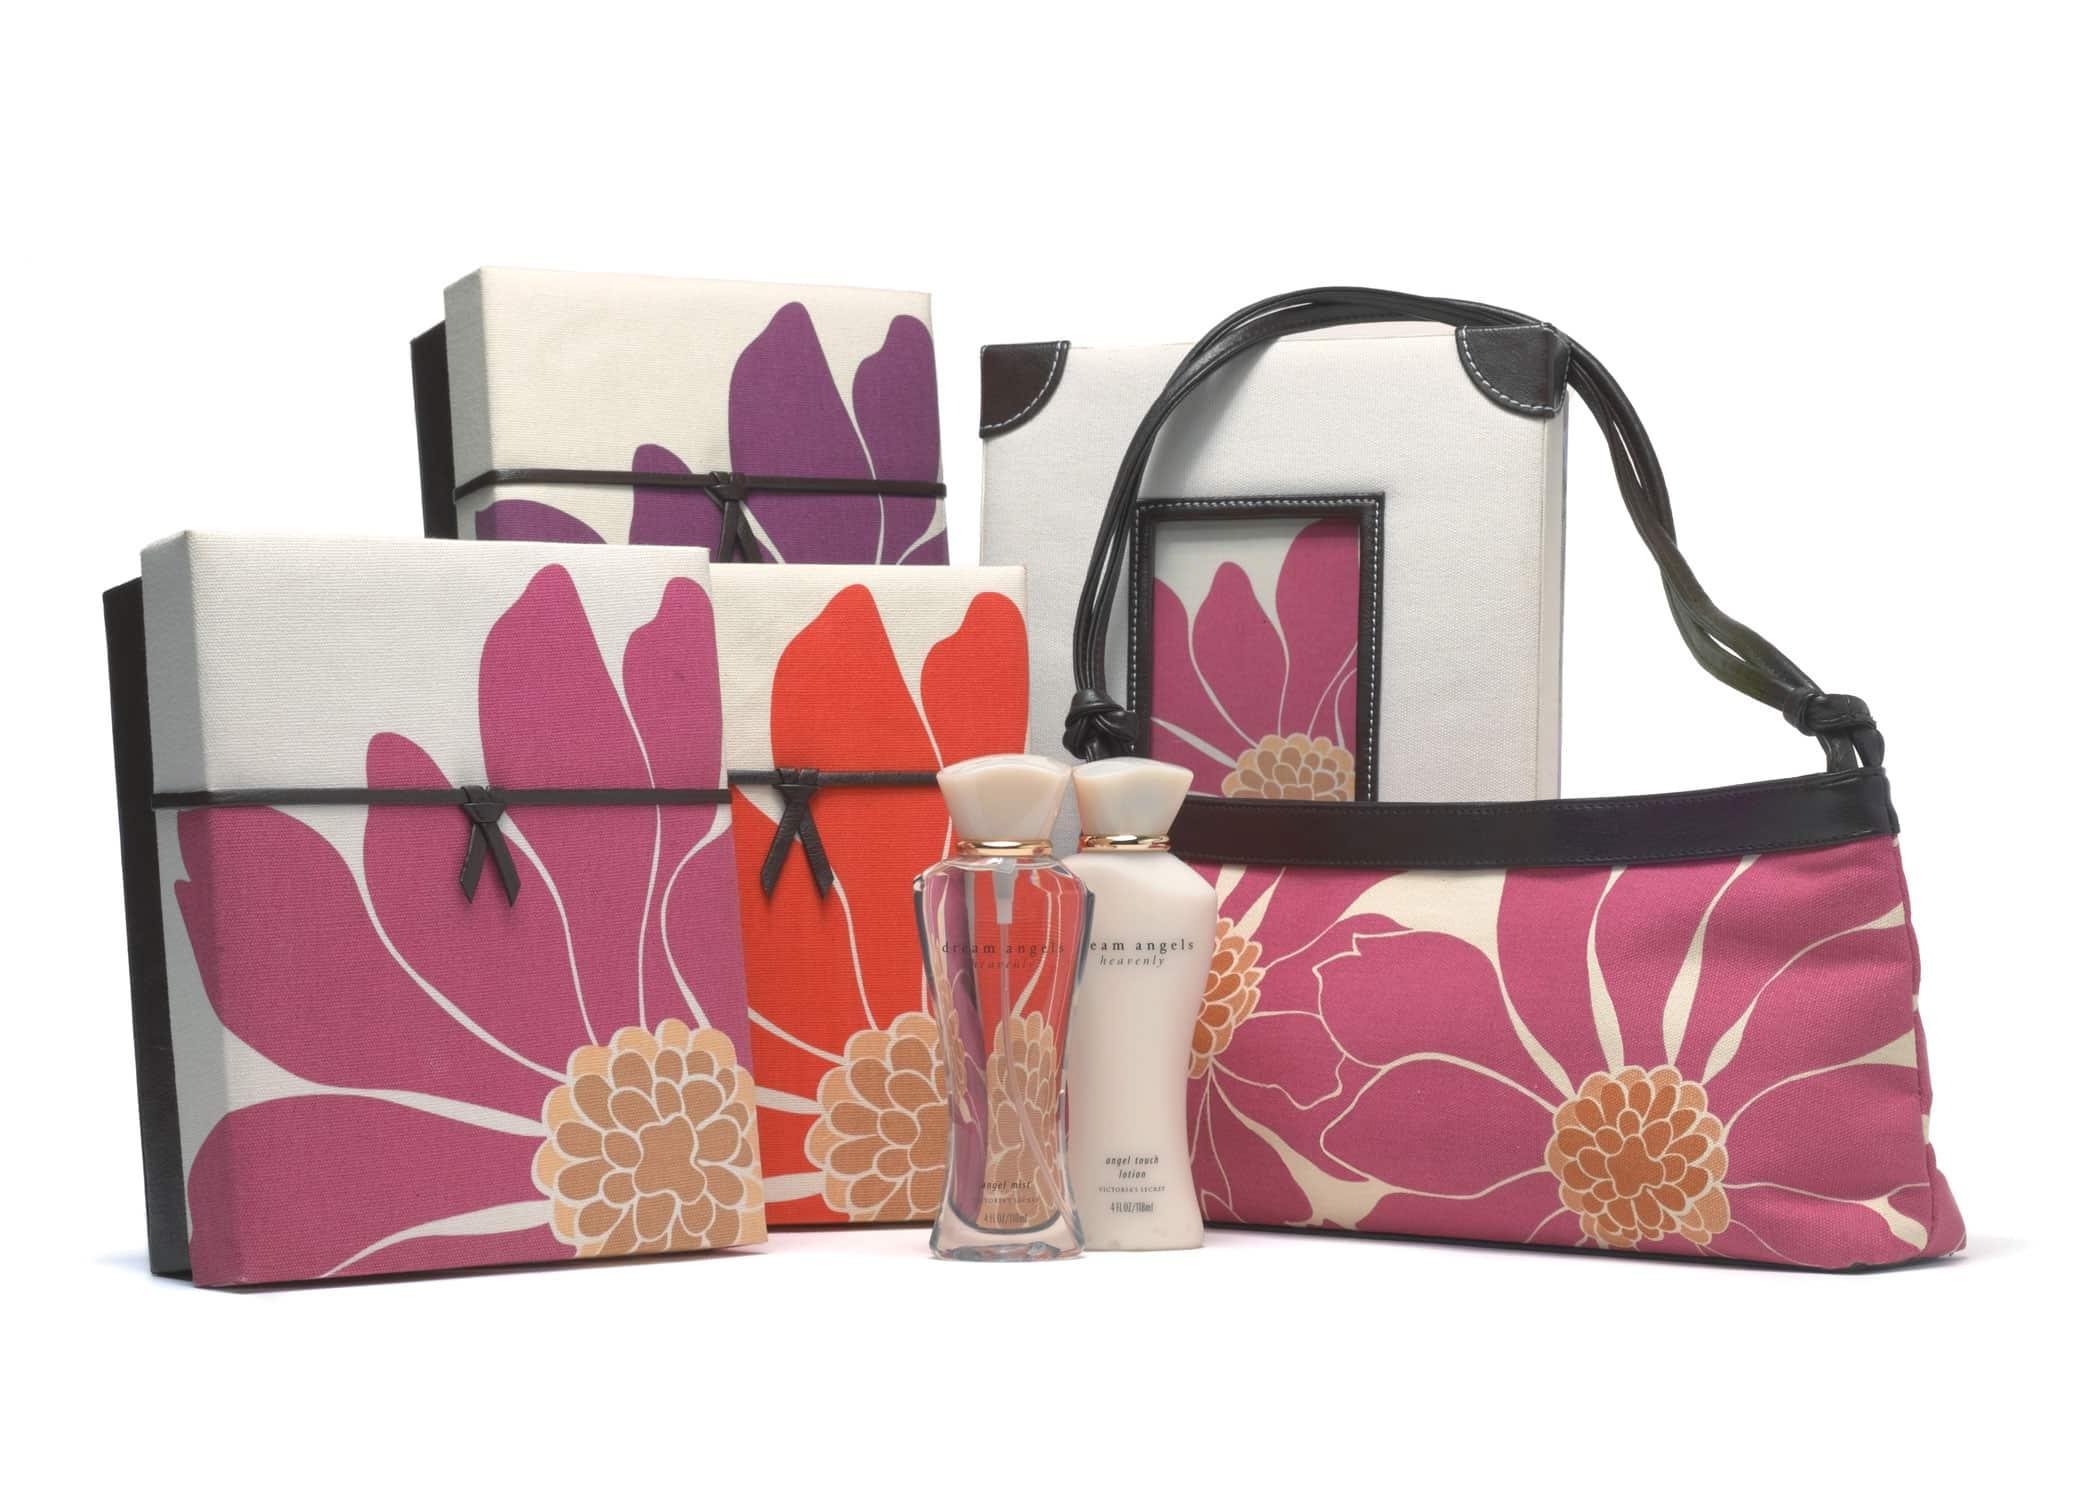 Victoria's Secret Dream Angels gift set design including fragrance bottles, boxes, and handbag with mauvey floral designs.